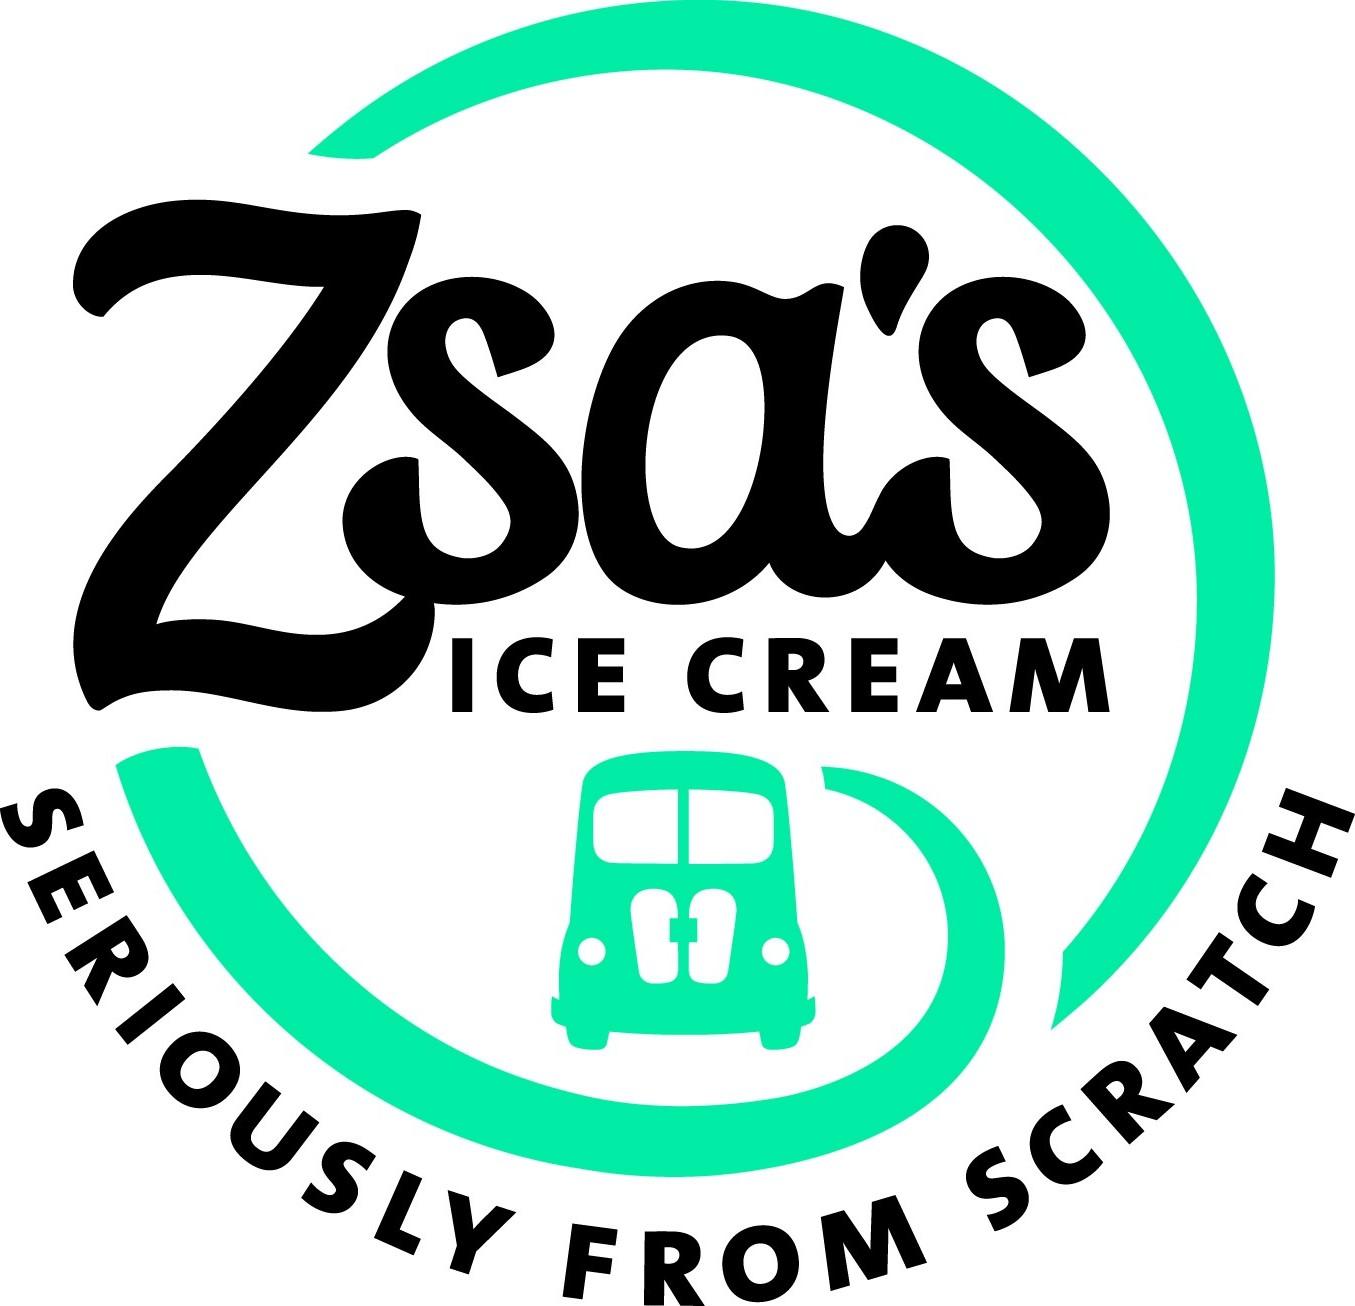 Zsas_logo_final_outlines_2color.jpg